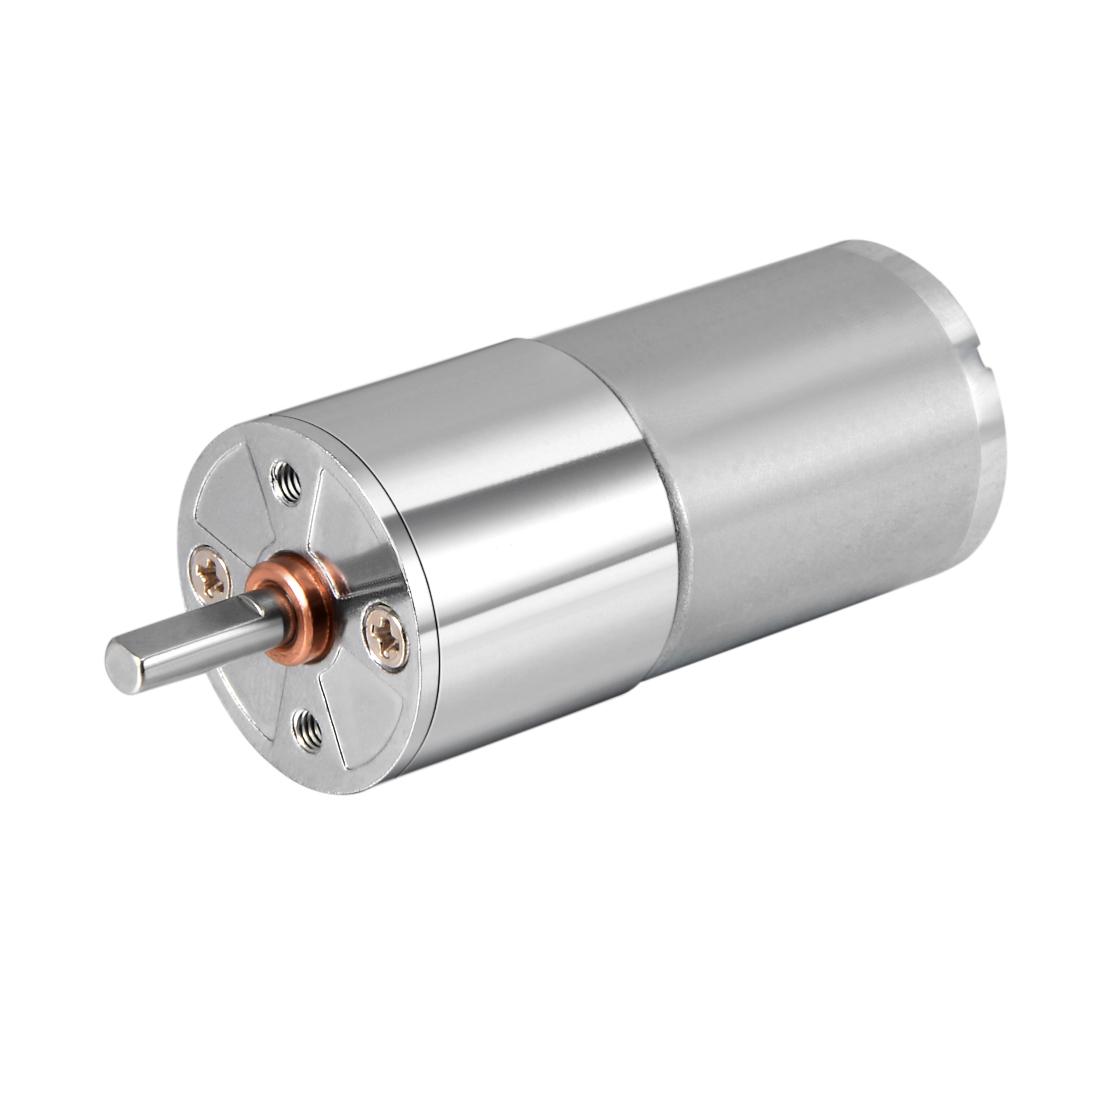 12V DC 60 RPM Gear Motor High Torque Reduction Gearbox Centric Output Shaft